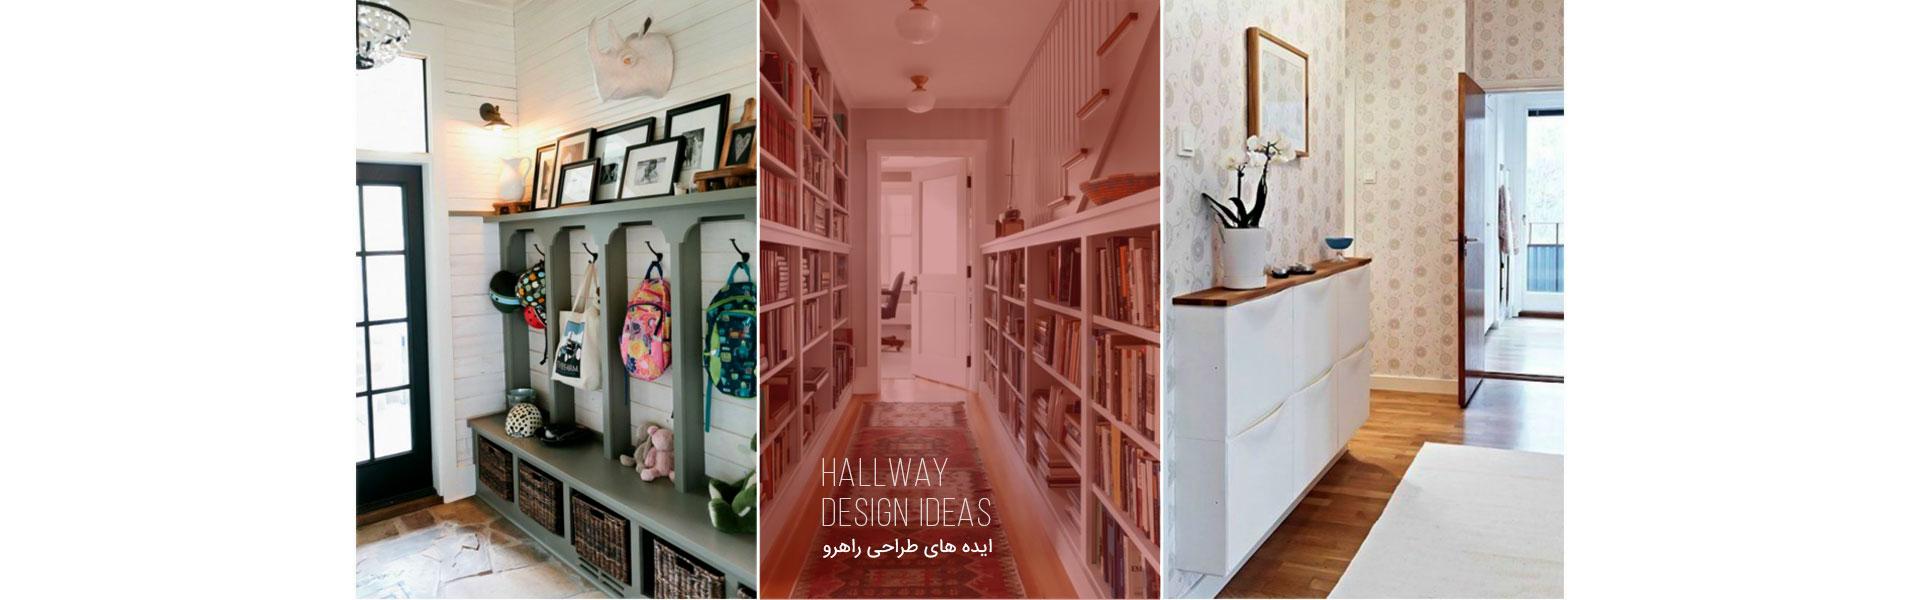 decorasion rahro1 - ایدههای طراحی راهرو